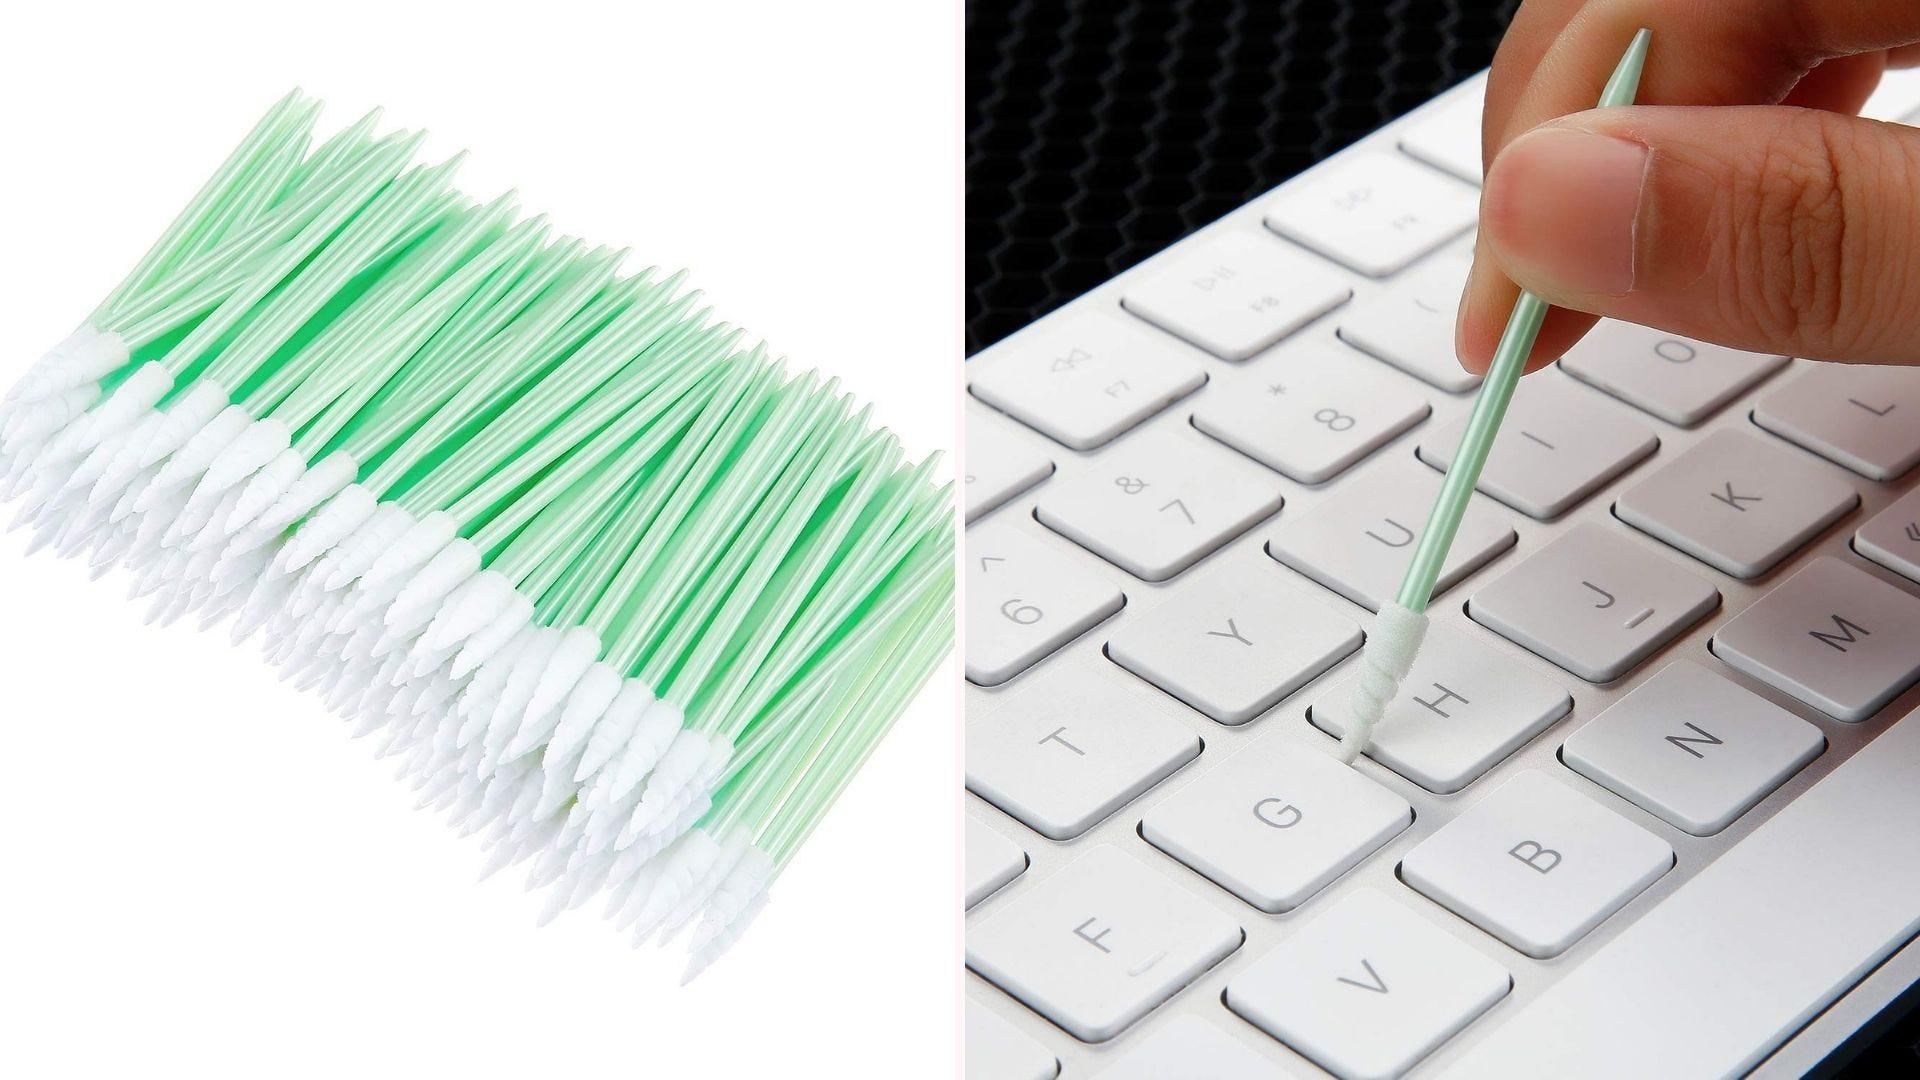 Swabs being used to clean computer keyboard.